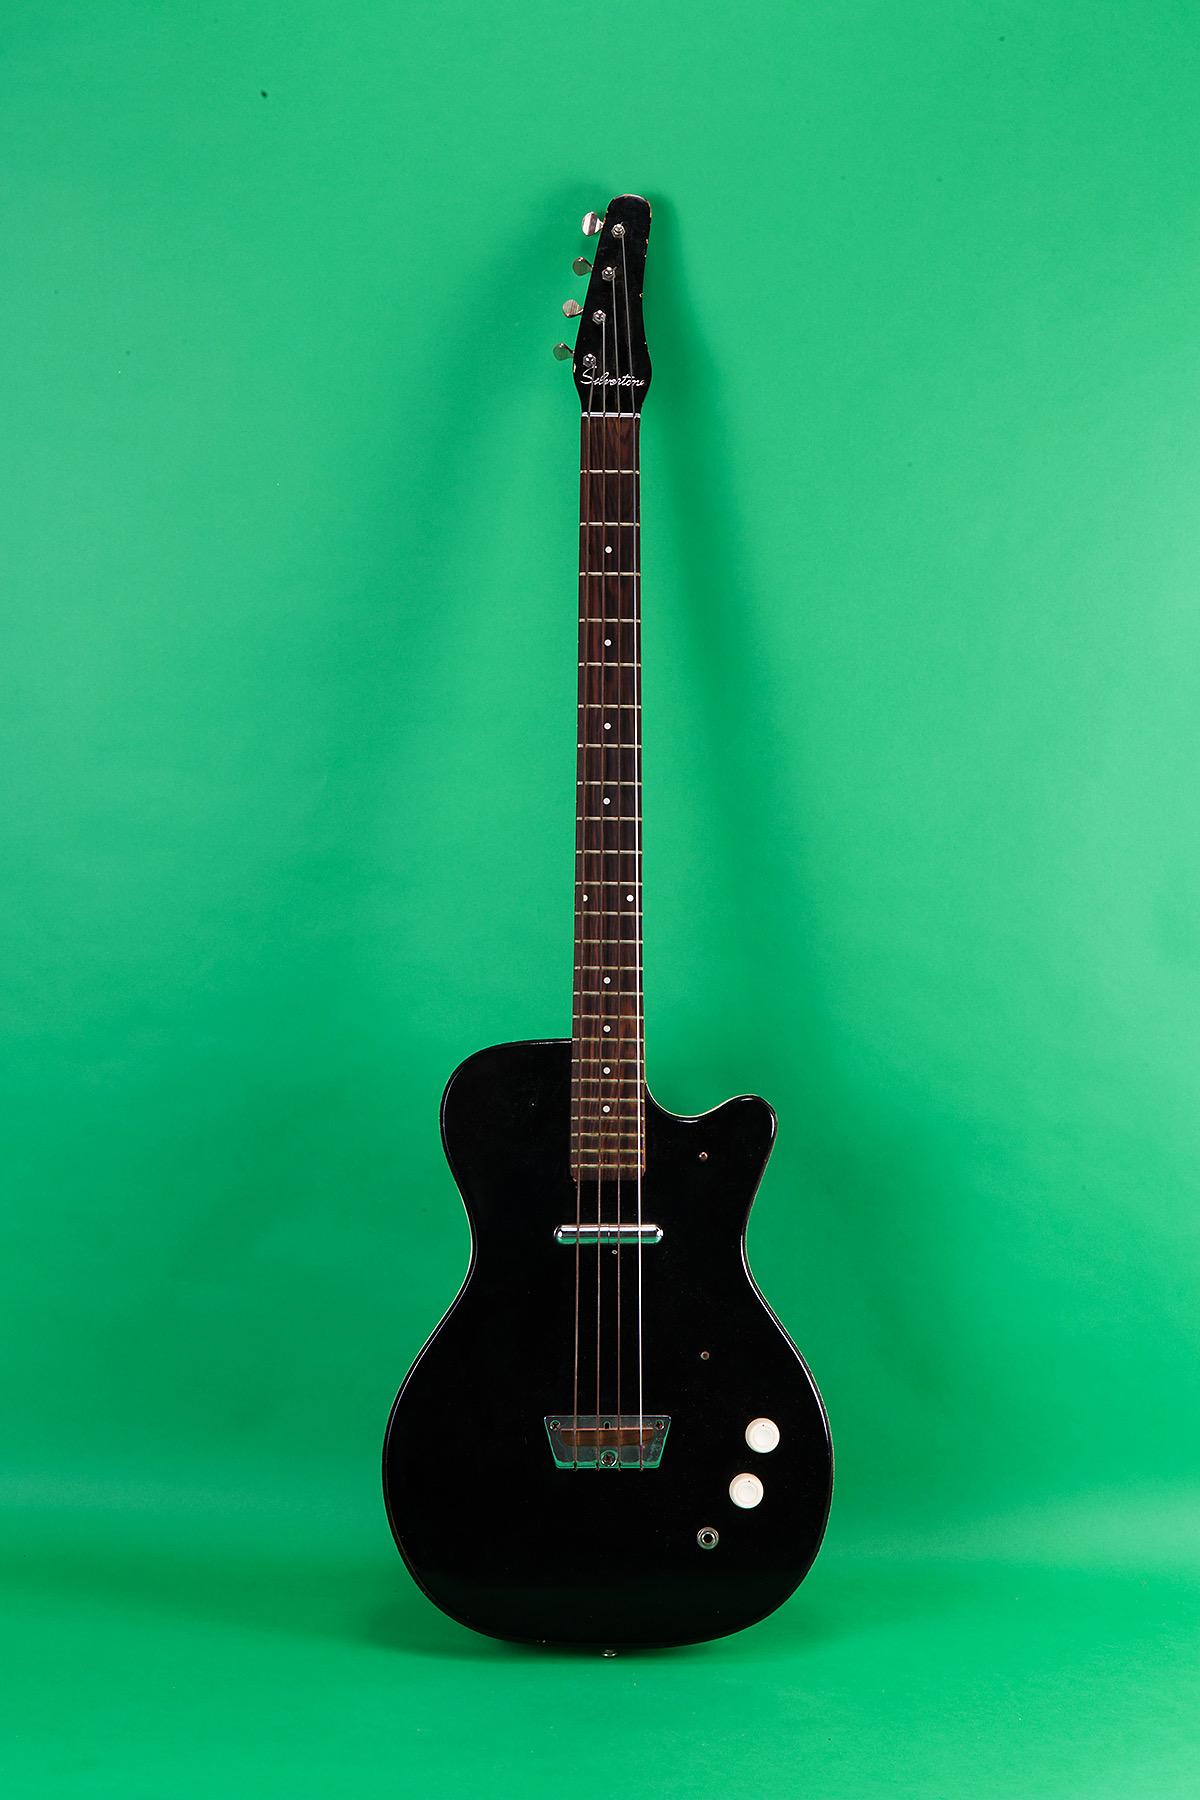 danelectro silvertone bass 1963 black bass for sale jay rosen music. Black Bedroom Furniture Sets. Home Design Ideas